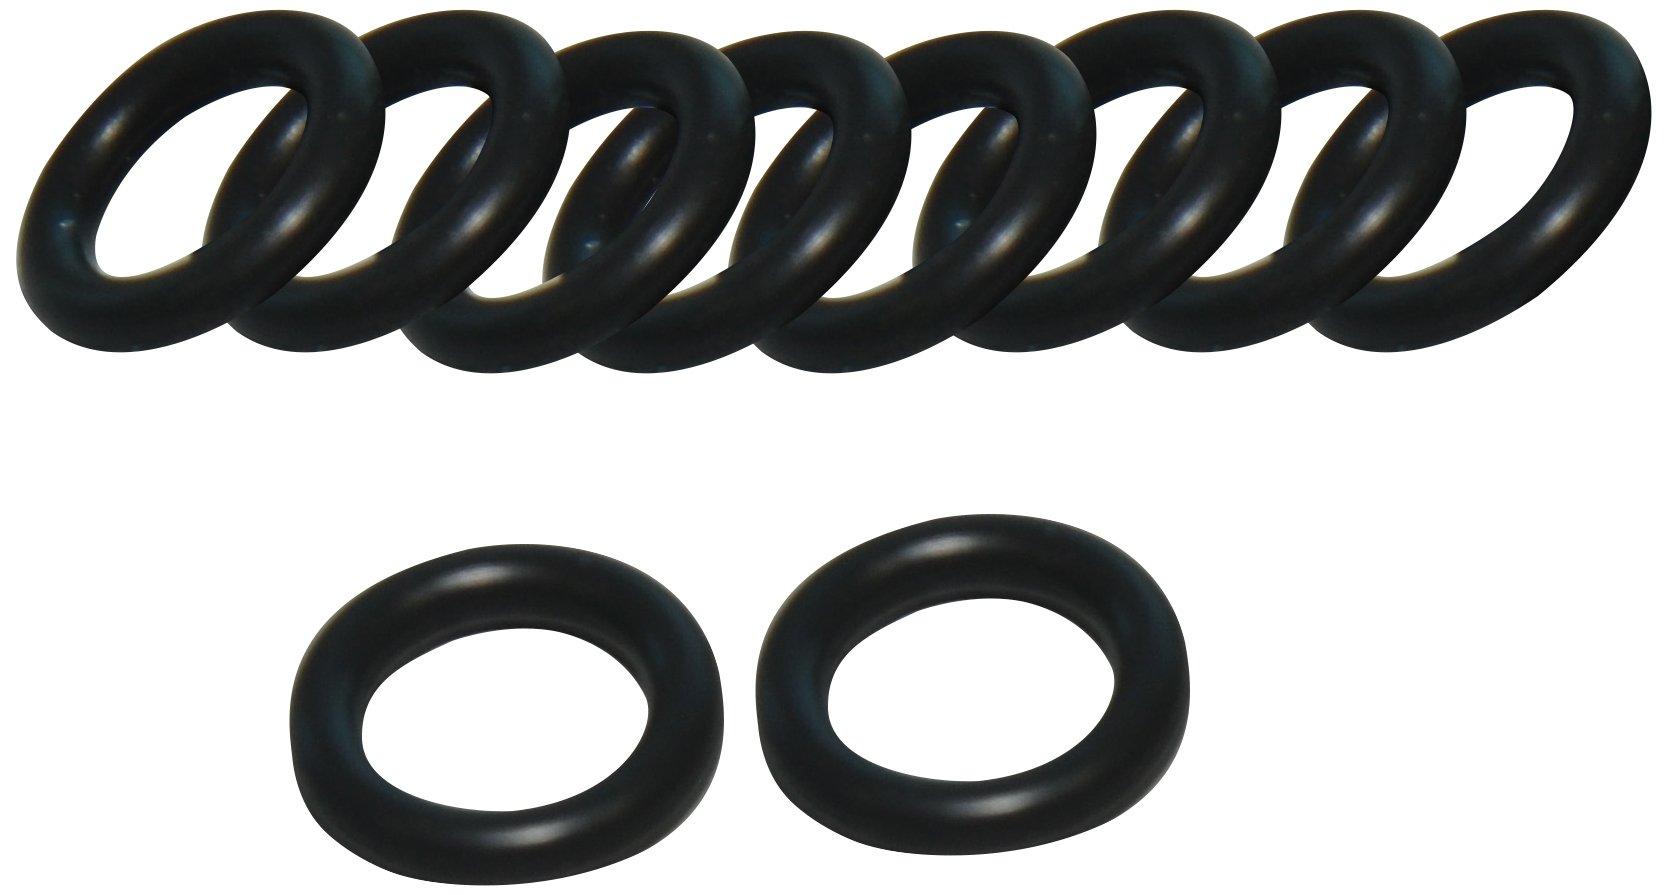 Markes International: Size 010, Low-Emission O-Ring, (Pack of 10) [U-COV10] by Markes International